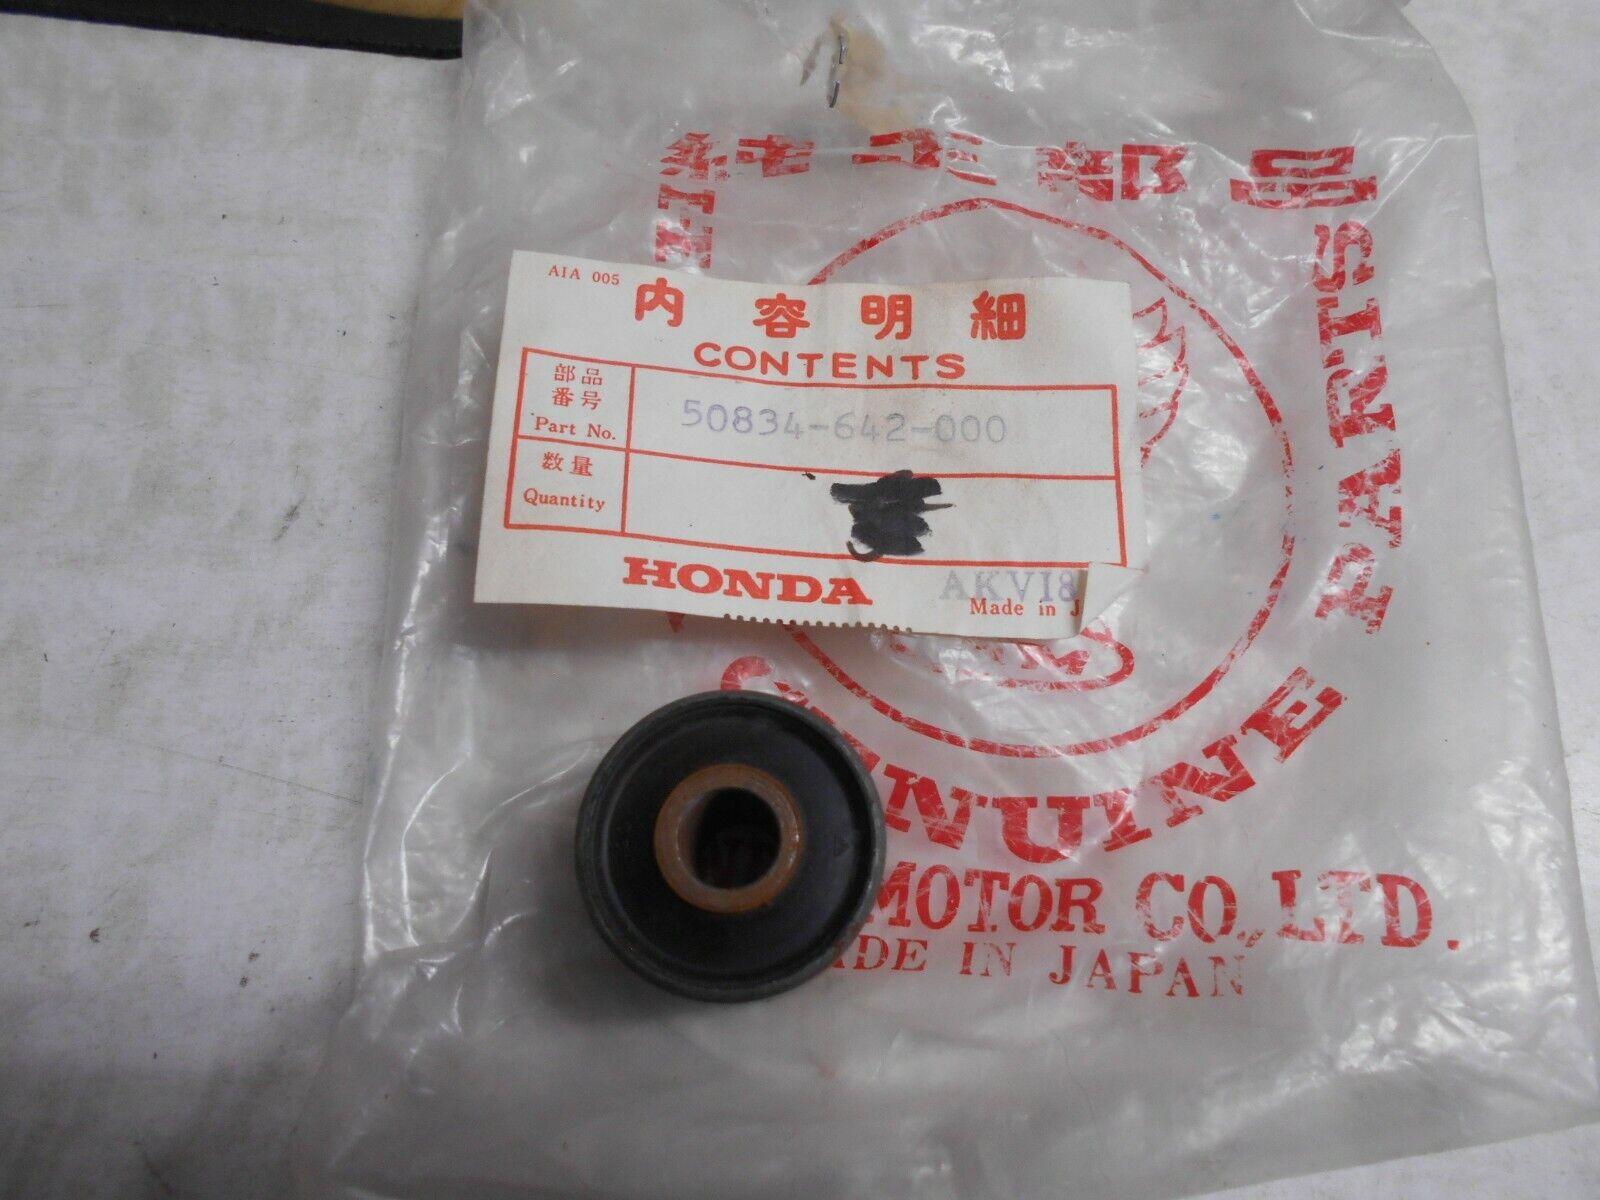 Car Parts - GENUINE HONDA CAR PARTS TORQUE ROD RUBBER BUSH A CIVIC 2 &3 DR1200 50834-642-000